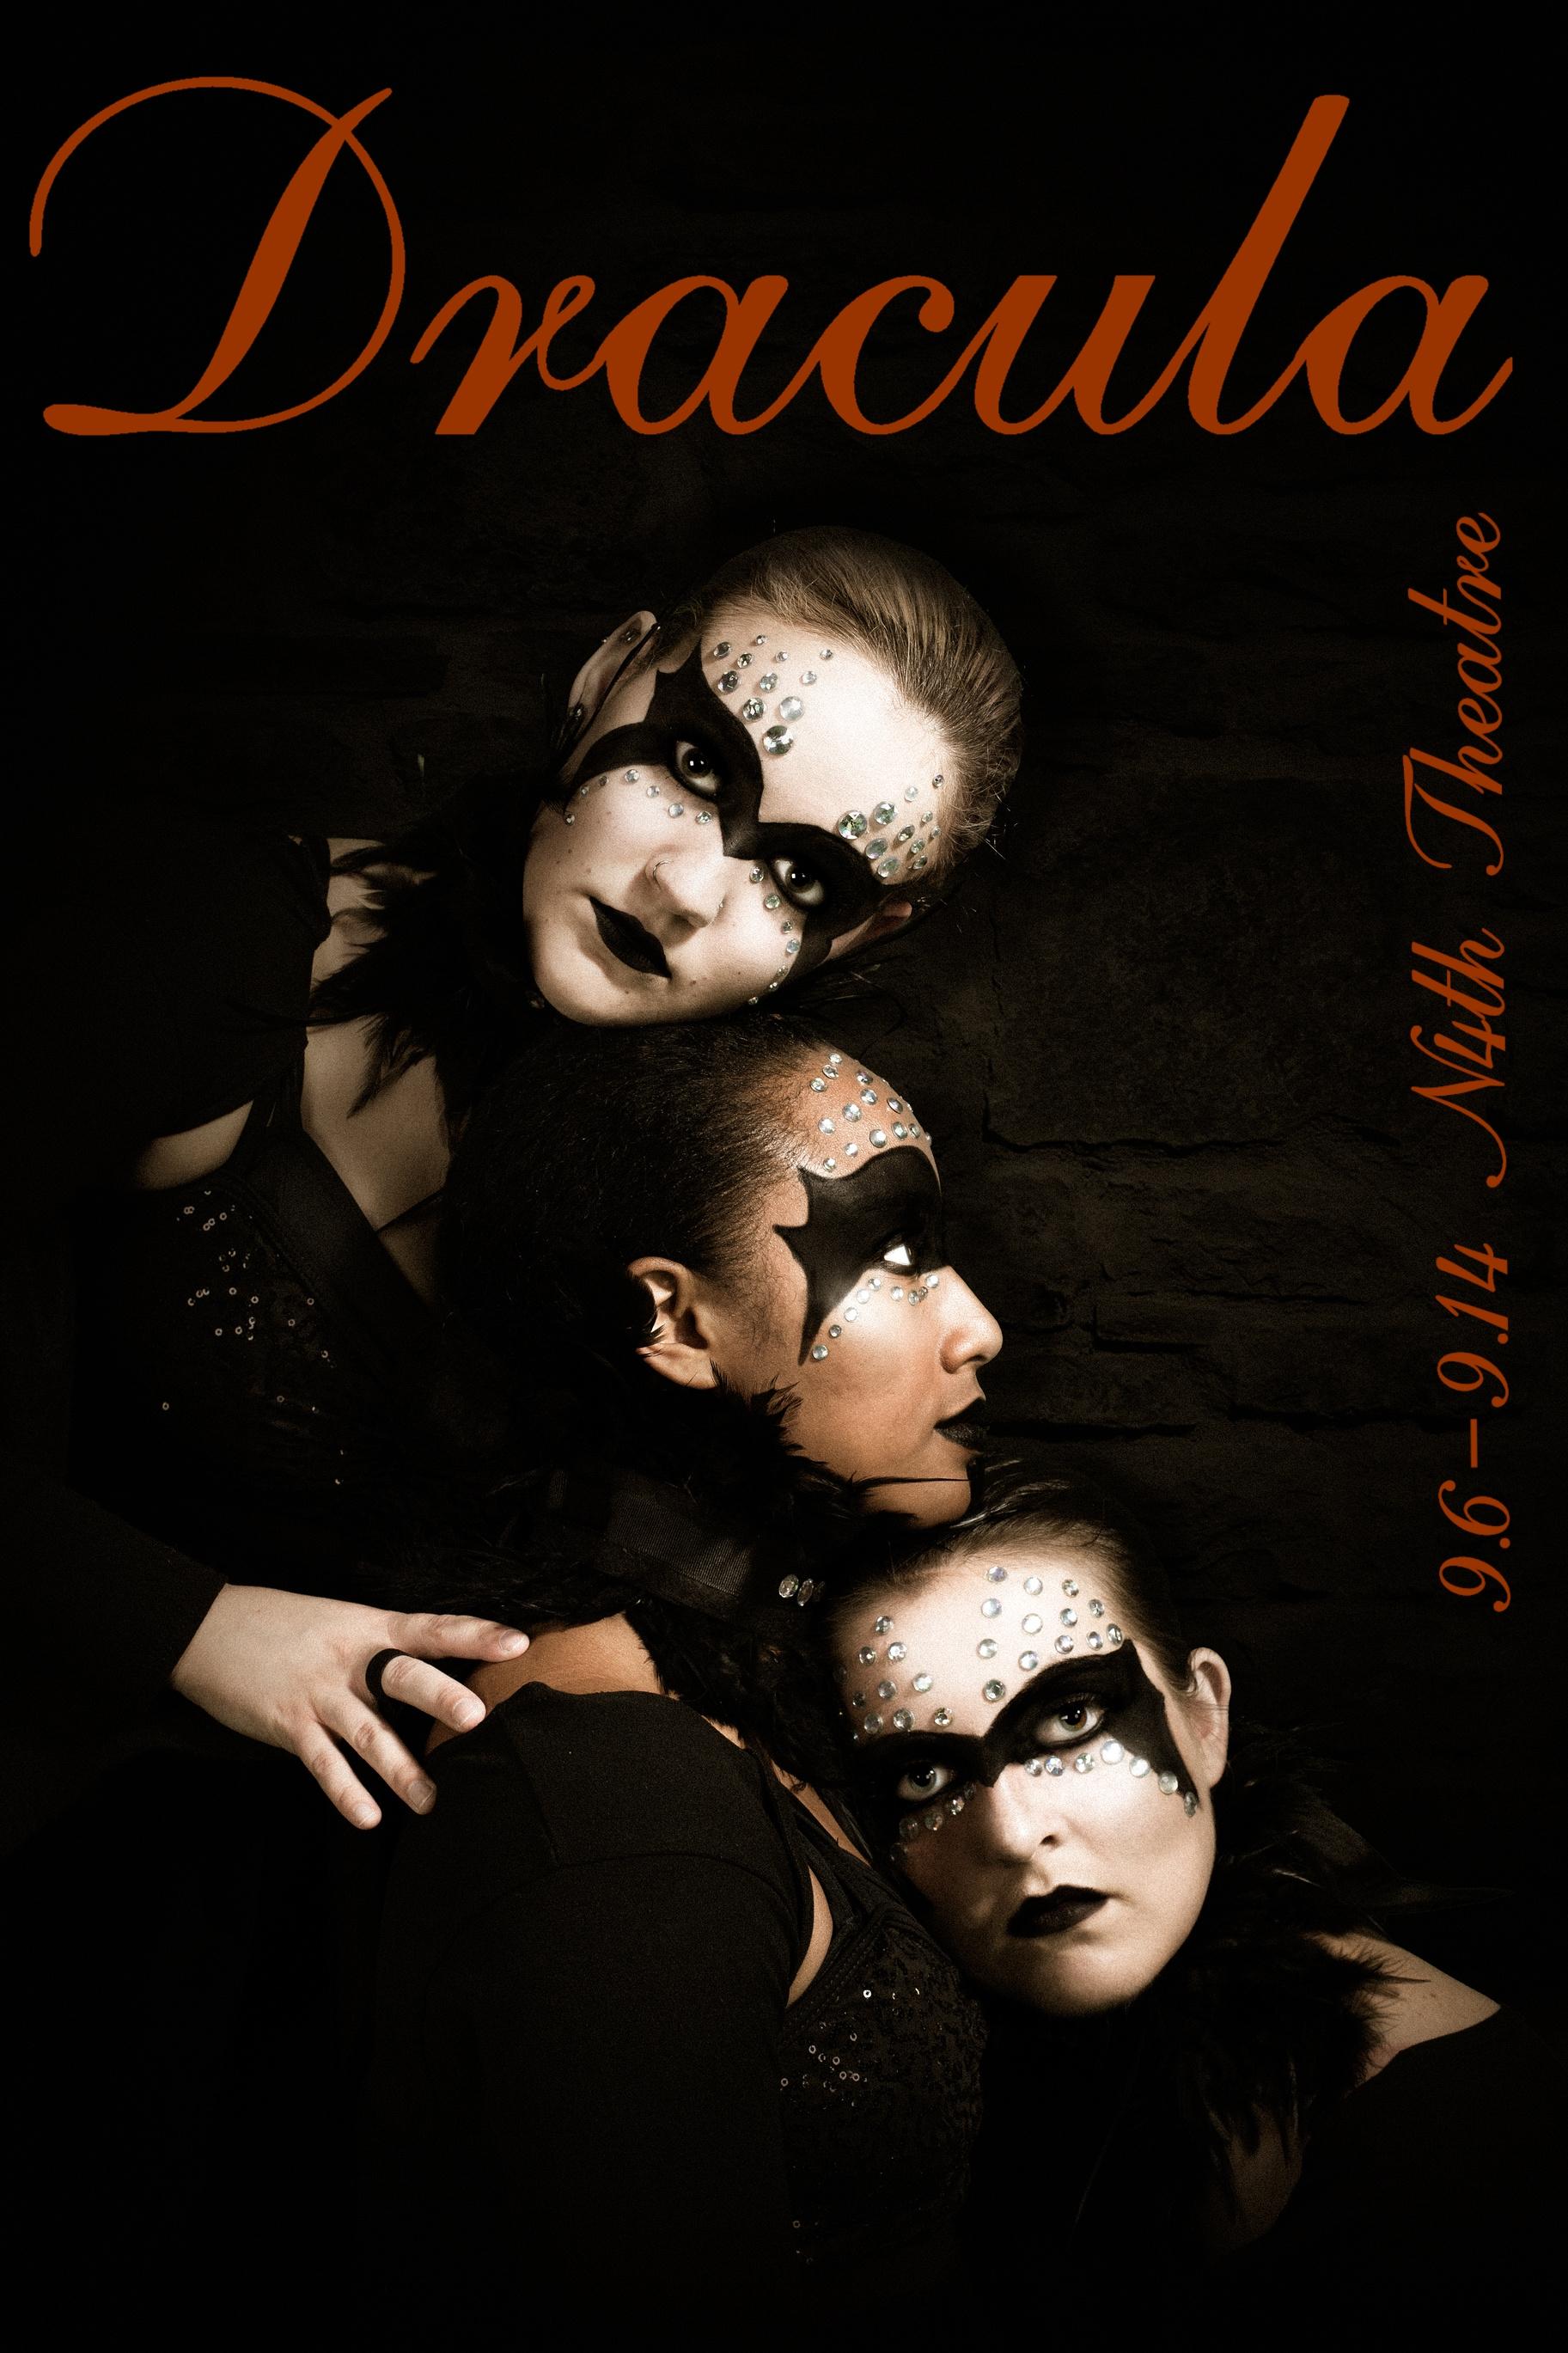 Dracula Promo Bats.jpeg